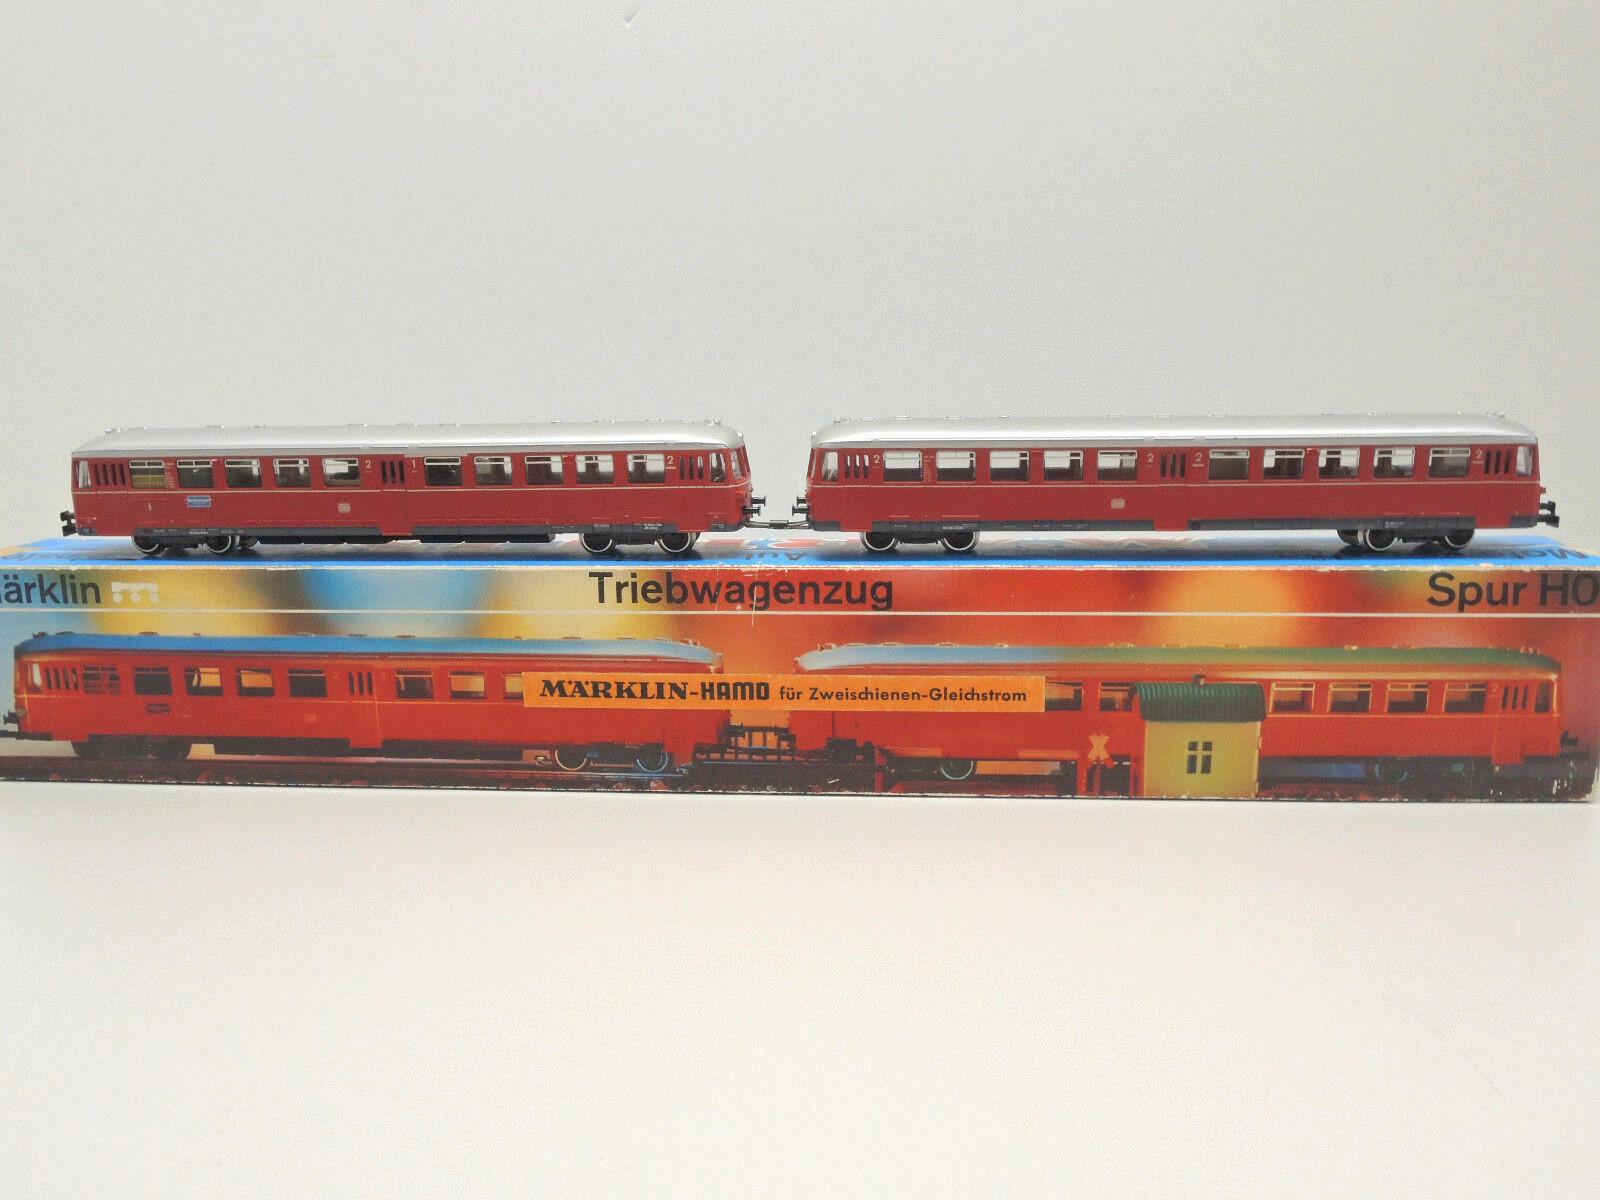 HAMO 8376 DC, triebwagenzug della DB, 1./2. classe, + 2. classe, OVP